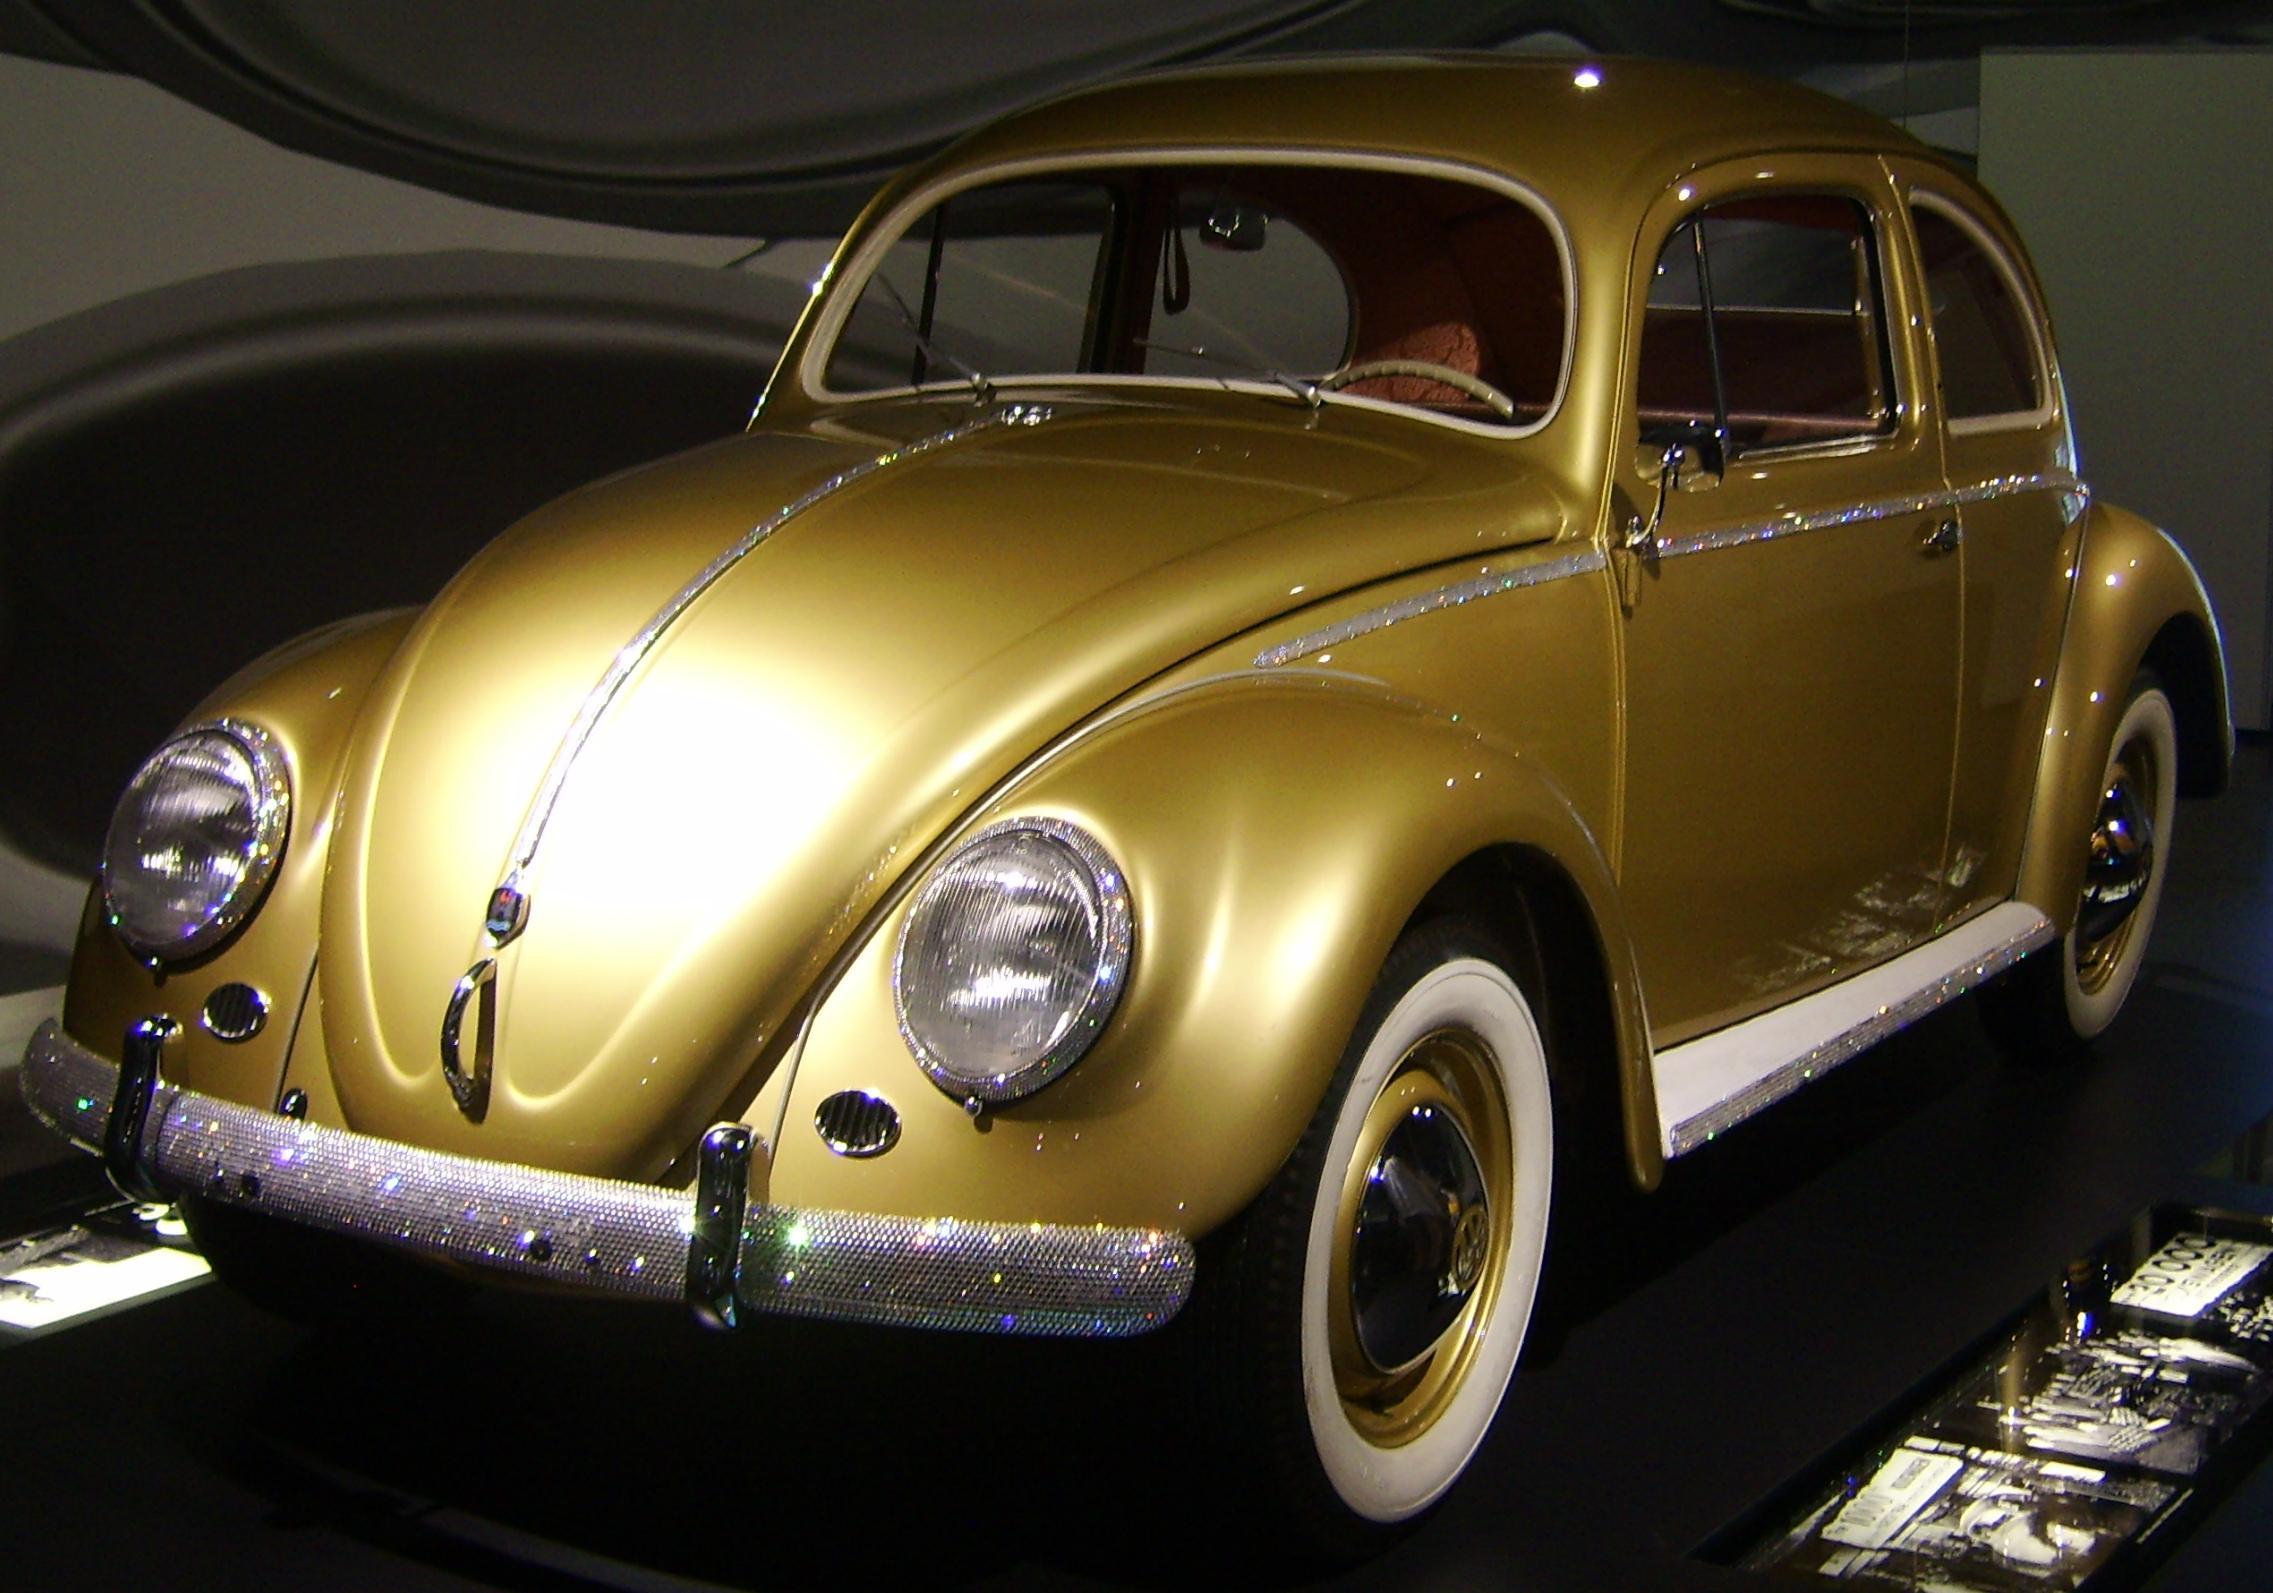 Golden One Car Loan Payment